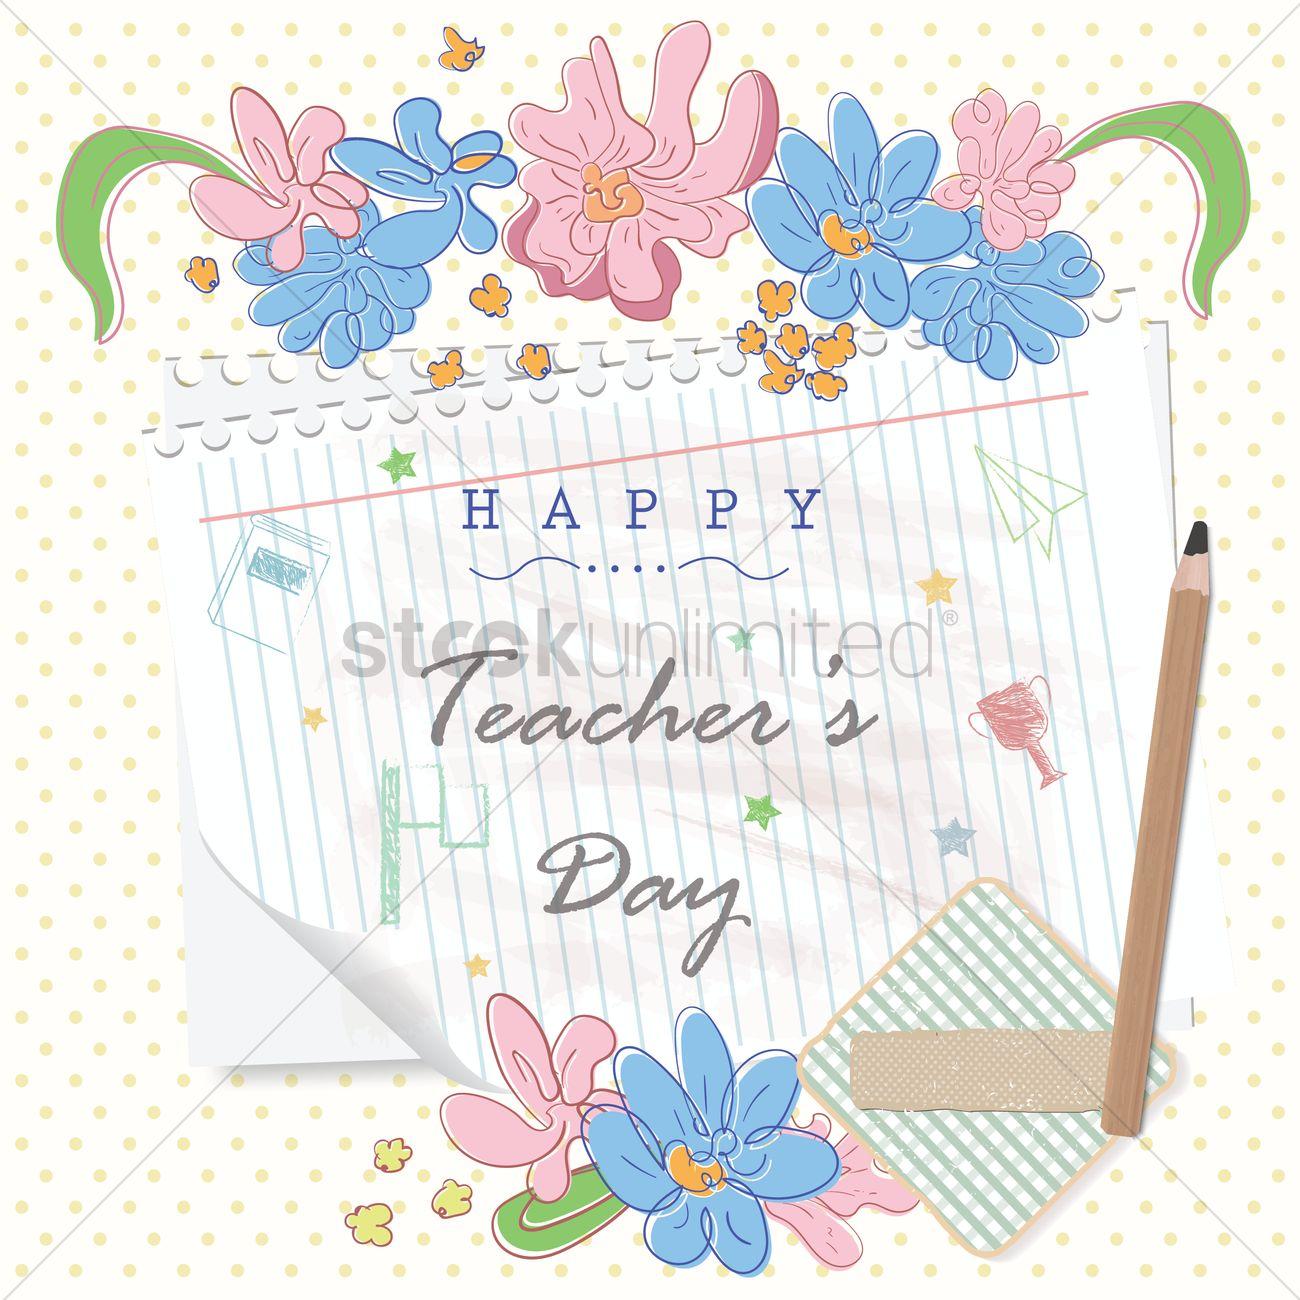 Happy Teachers Day Design Vector Image 1987044 Stockunlimited